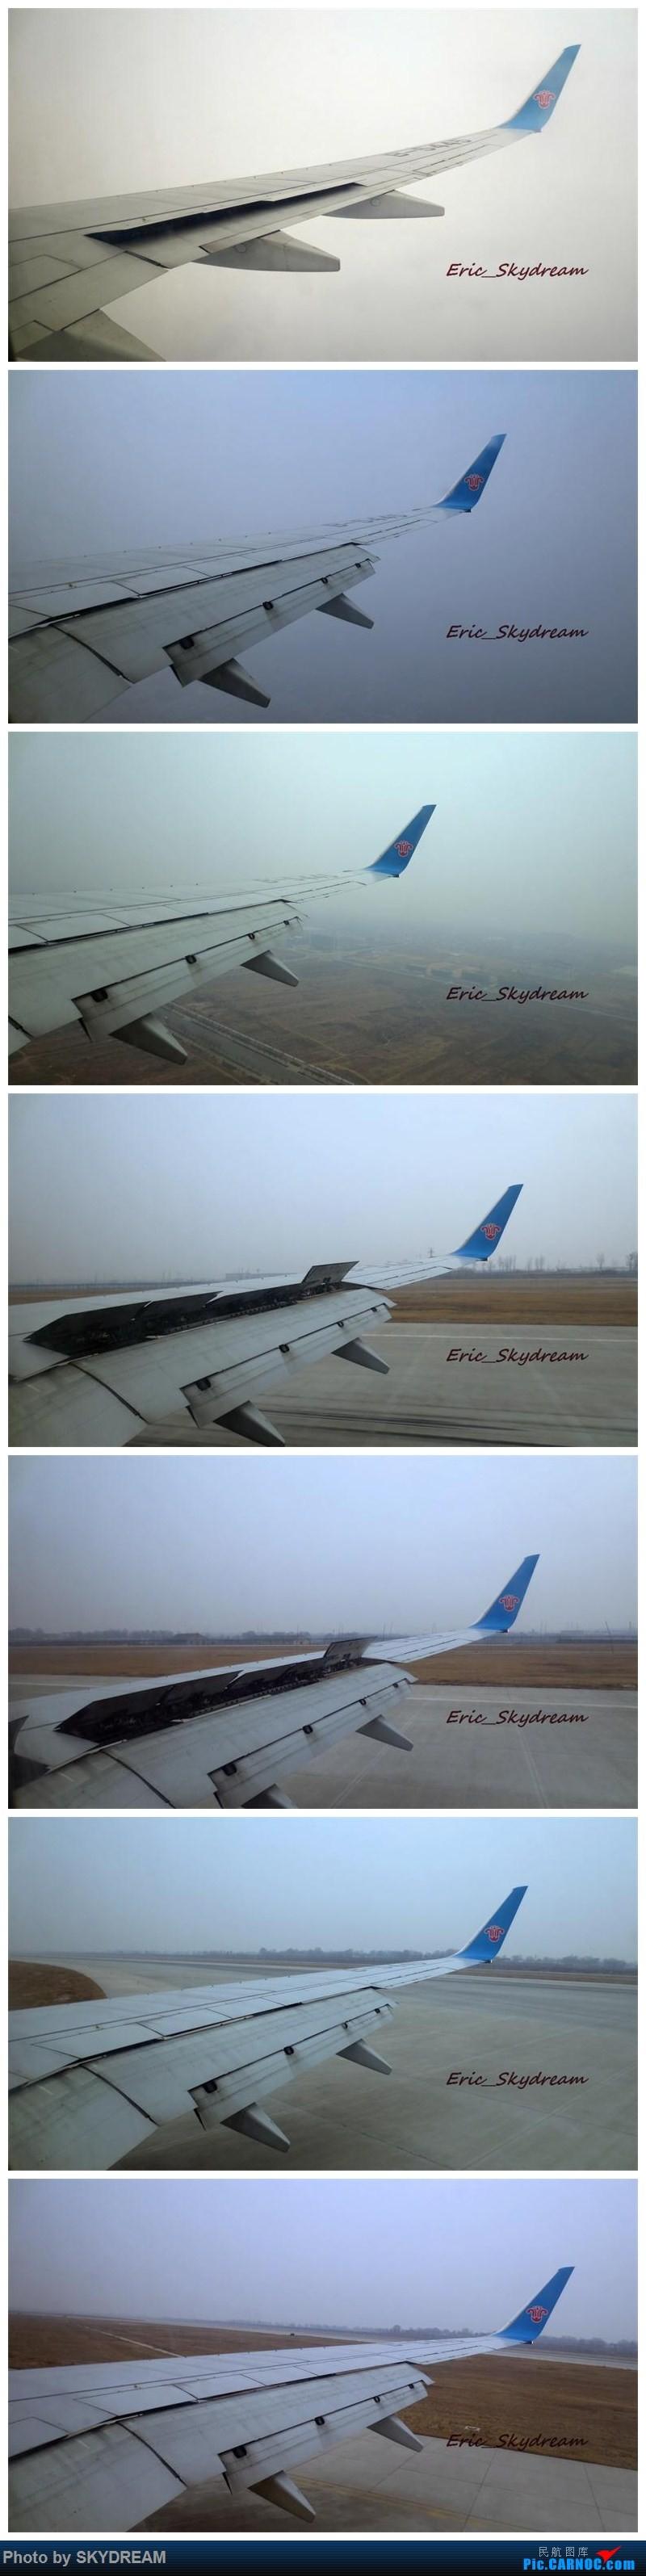 Re:[原创]<Eric's Journal> 01 飞雪 伙伴 御风长安之旅 BOEING 737-800 B-5445